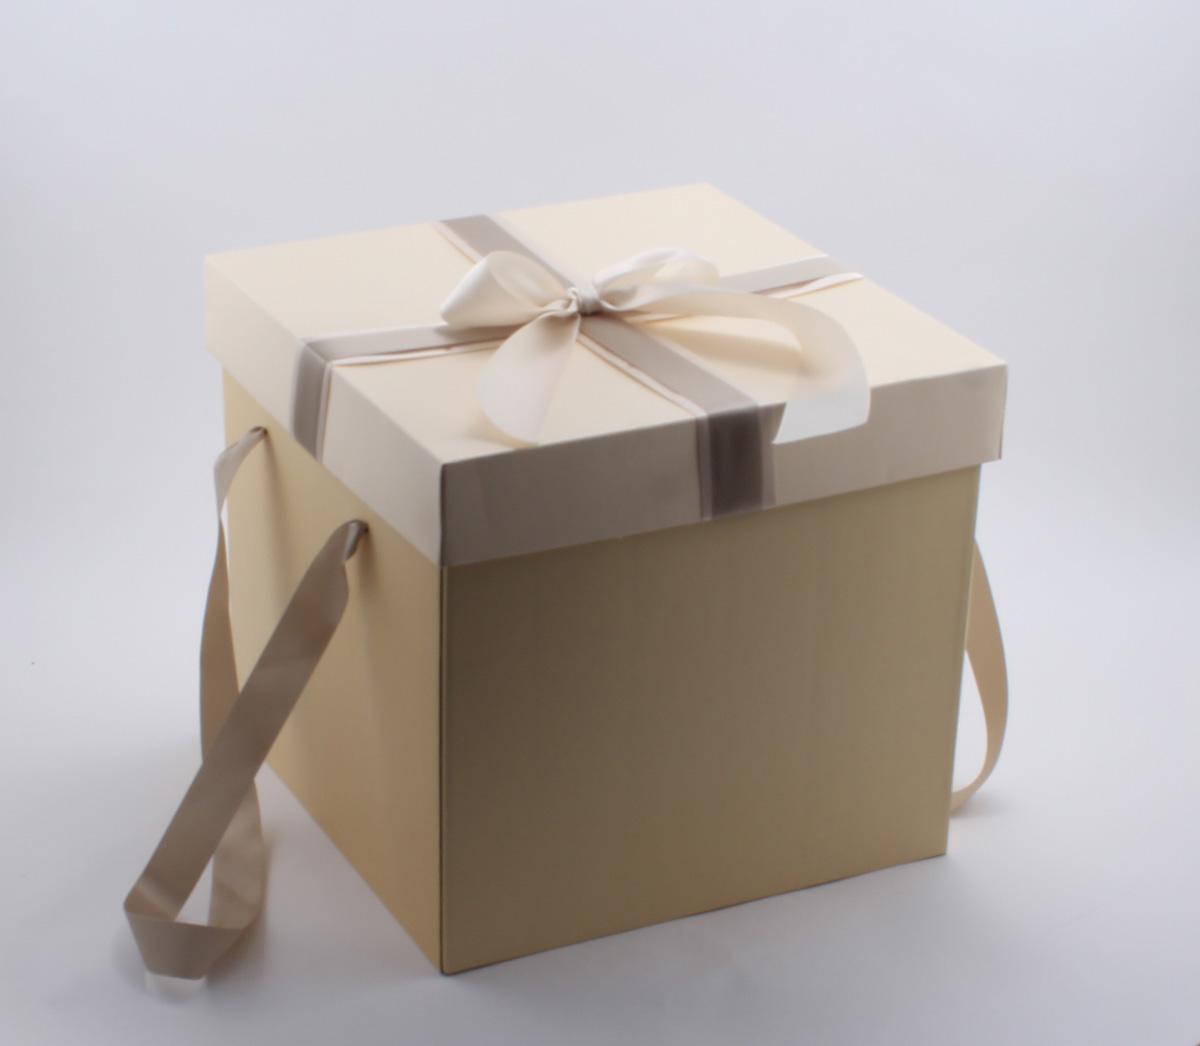 cutie-cadou-easypack-carton-8